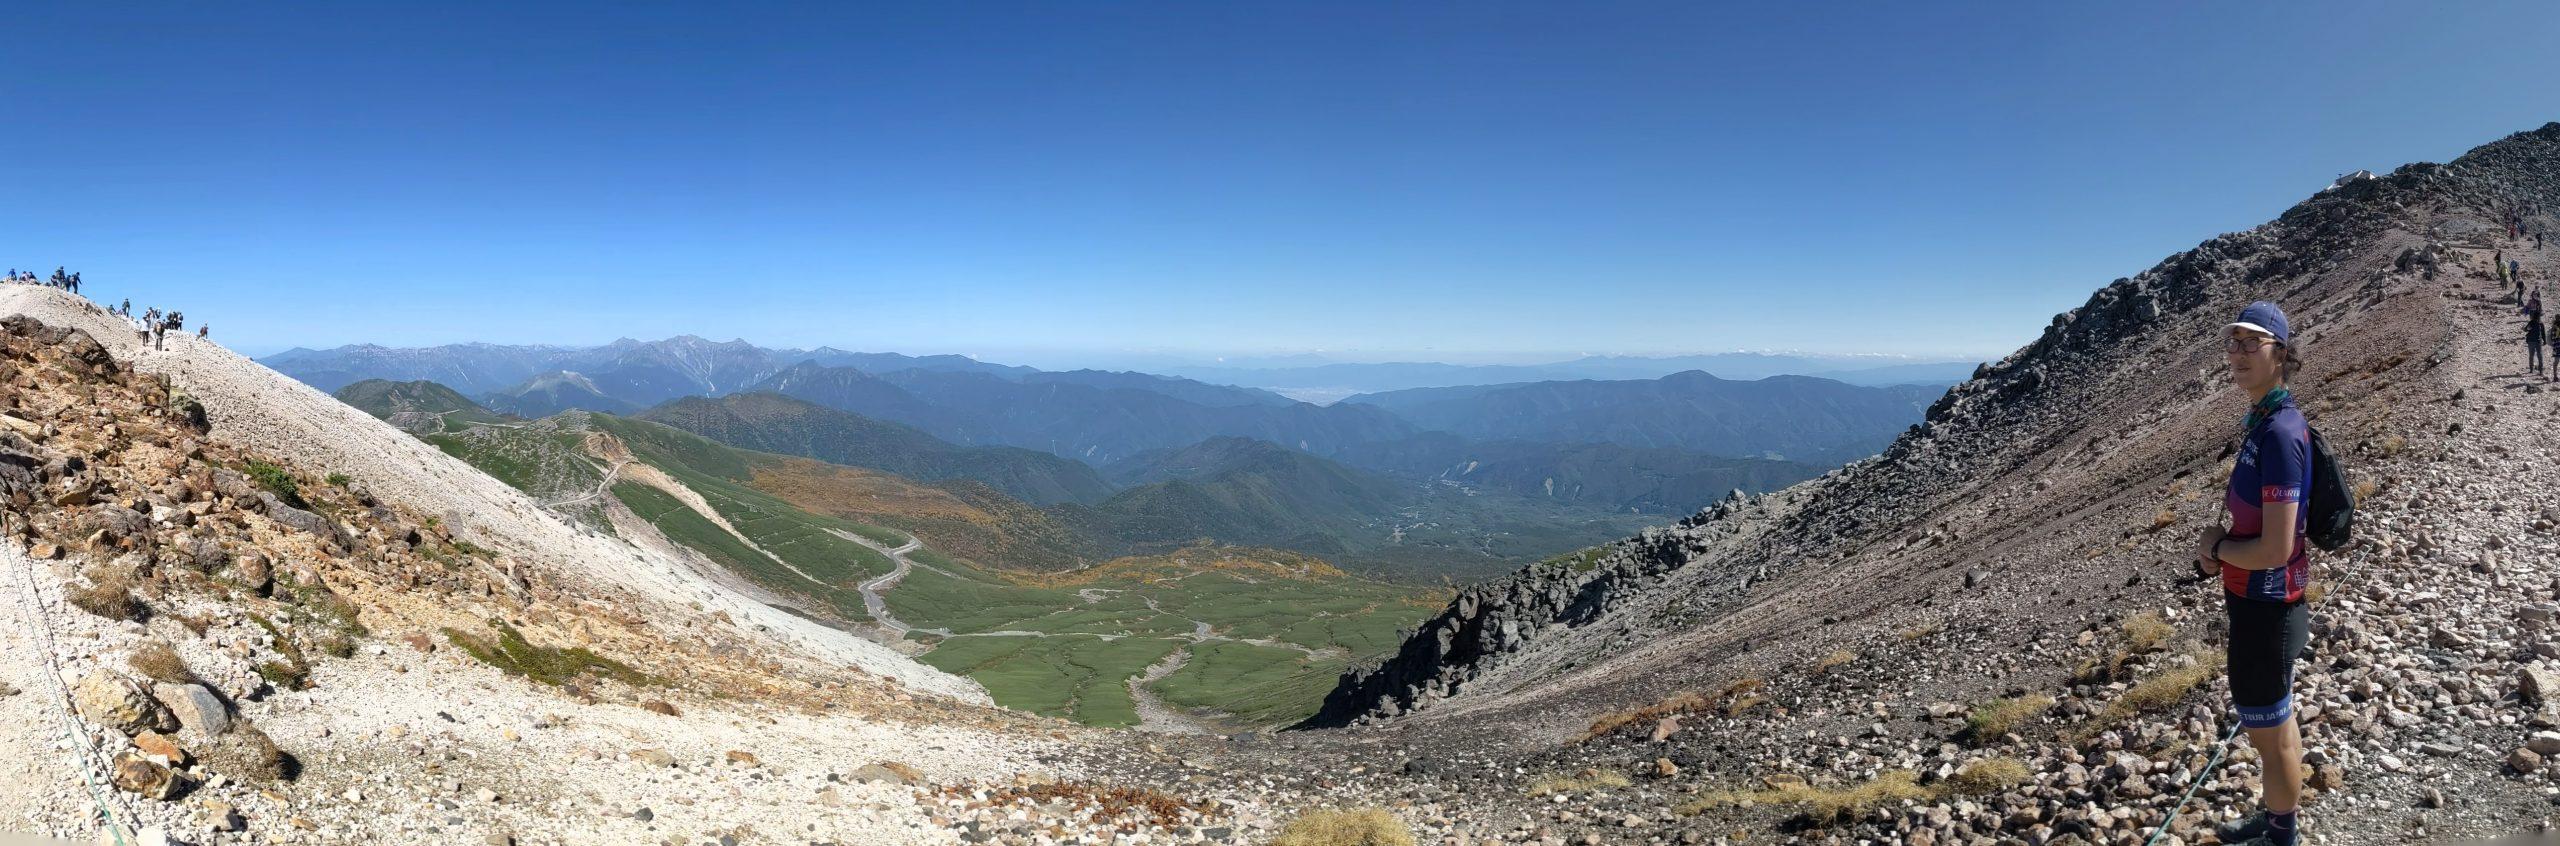 Viewpoints on Norikura-dake trail